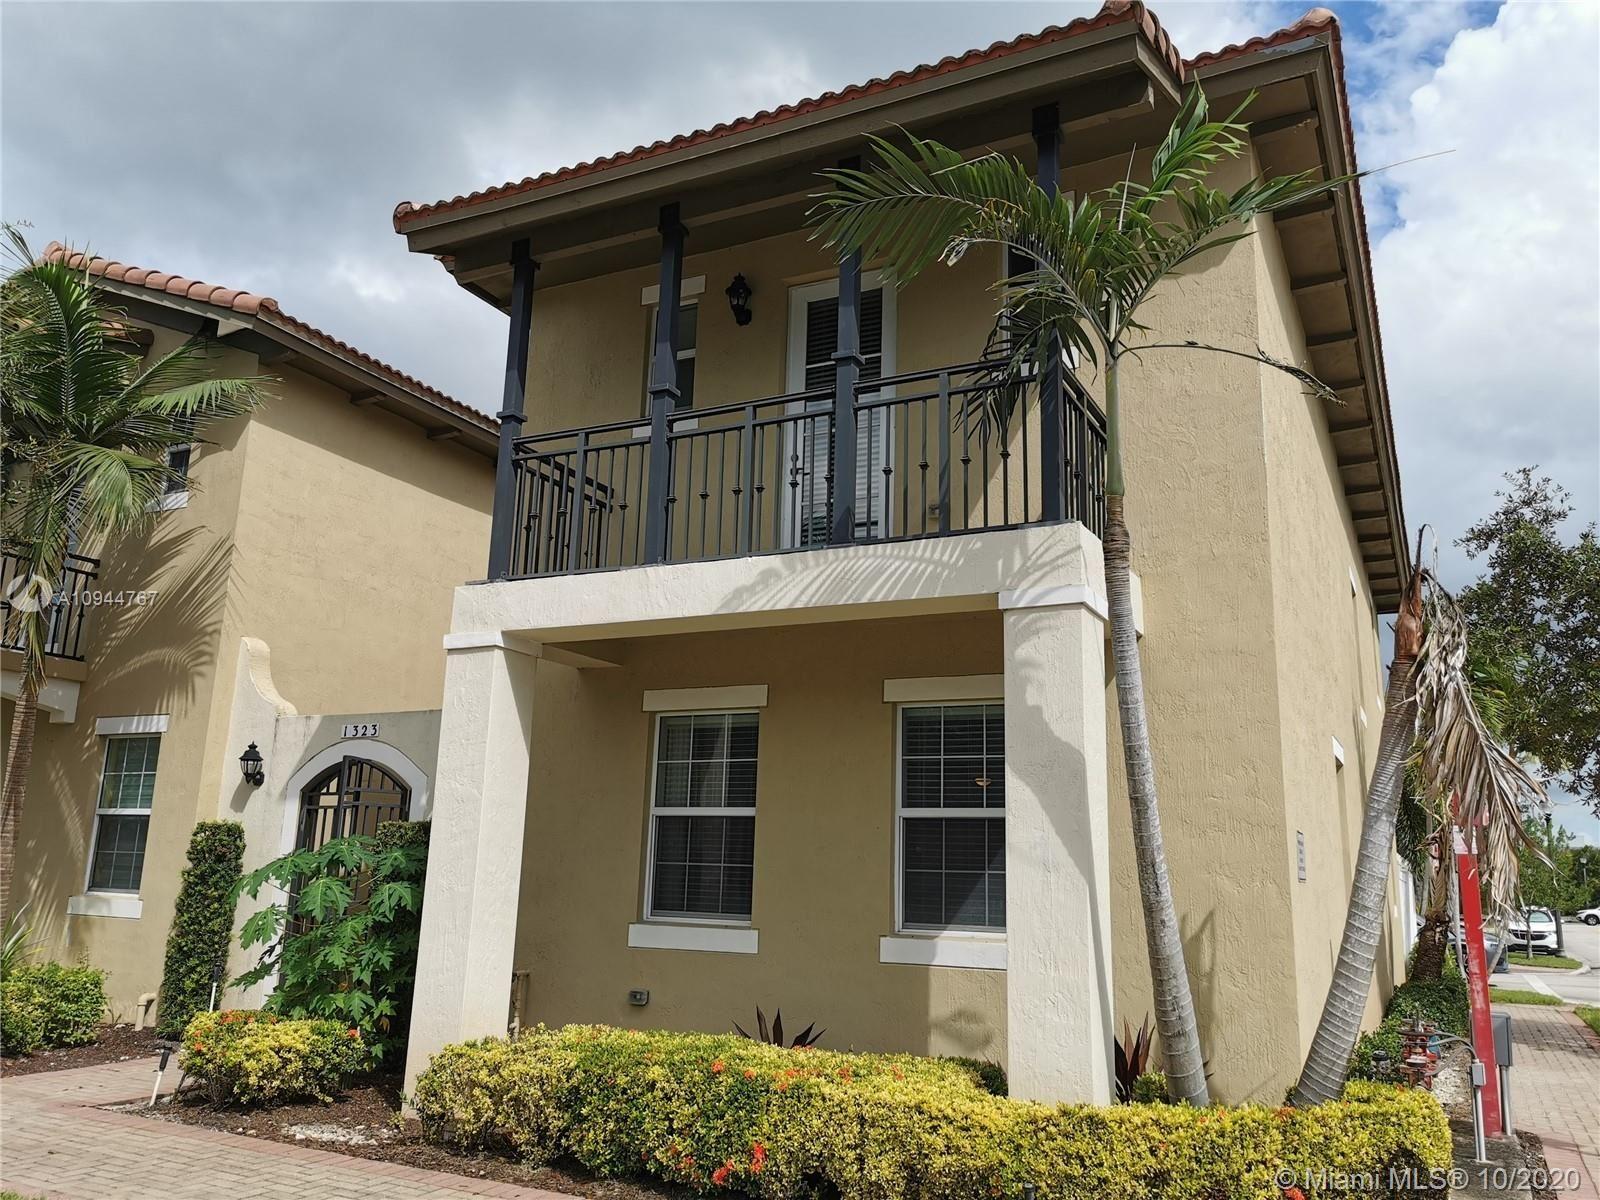 1323 SW 147th Ave, Pembroke Pines, FL 33027 - #: A10944767